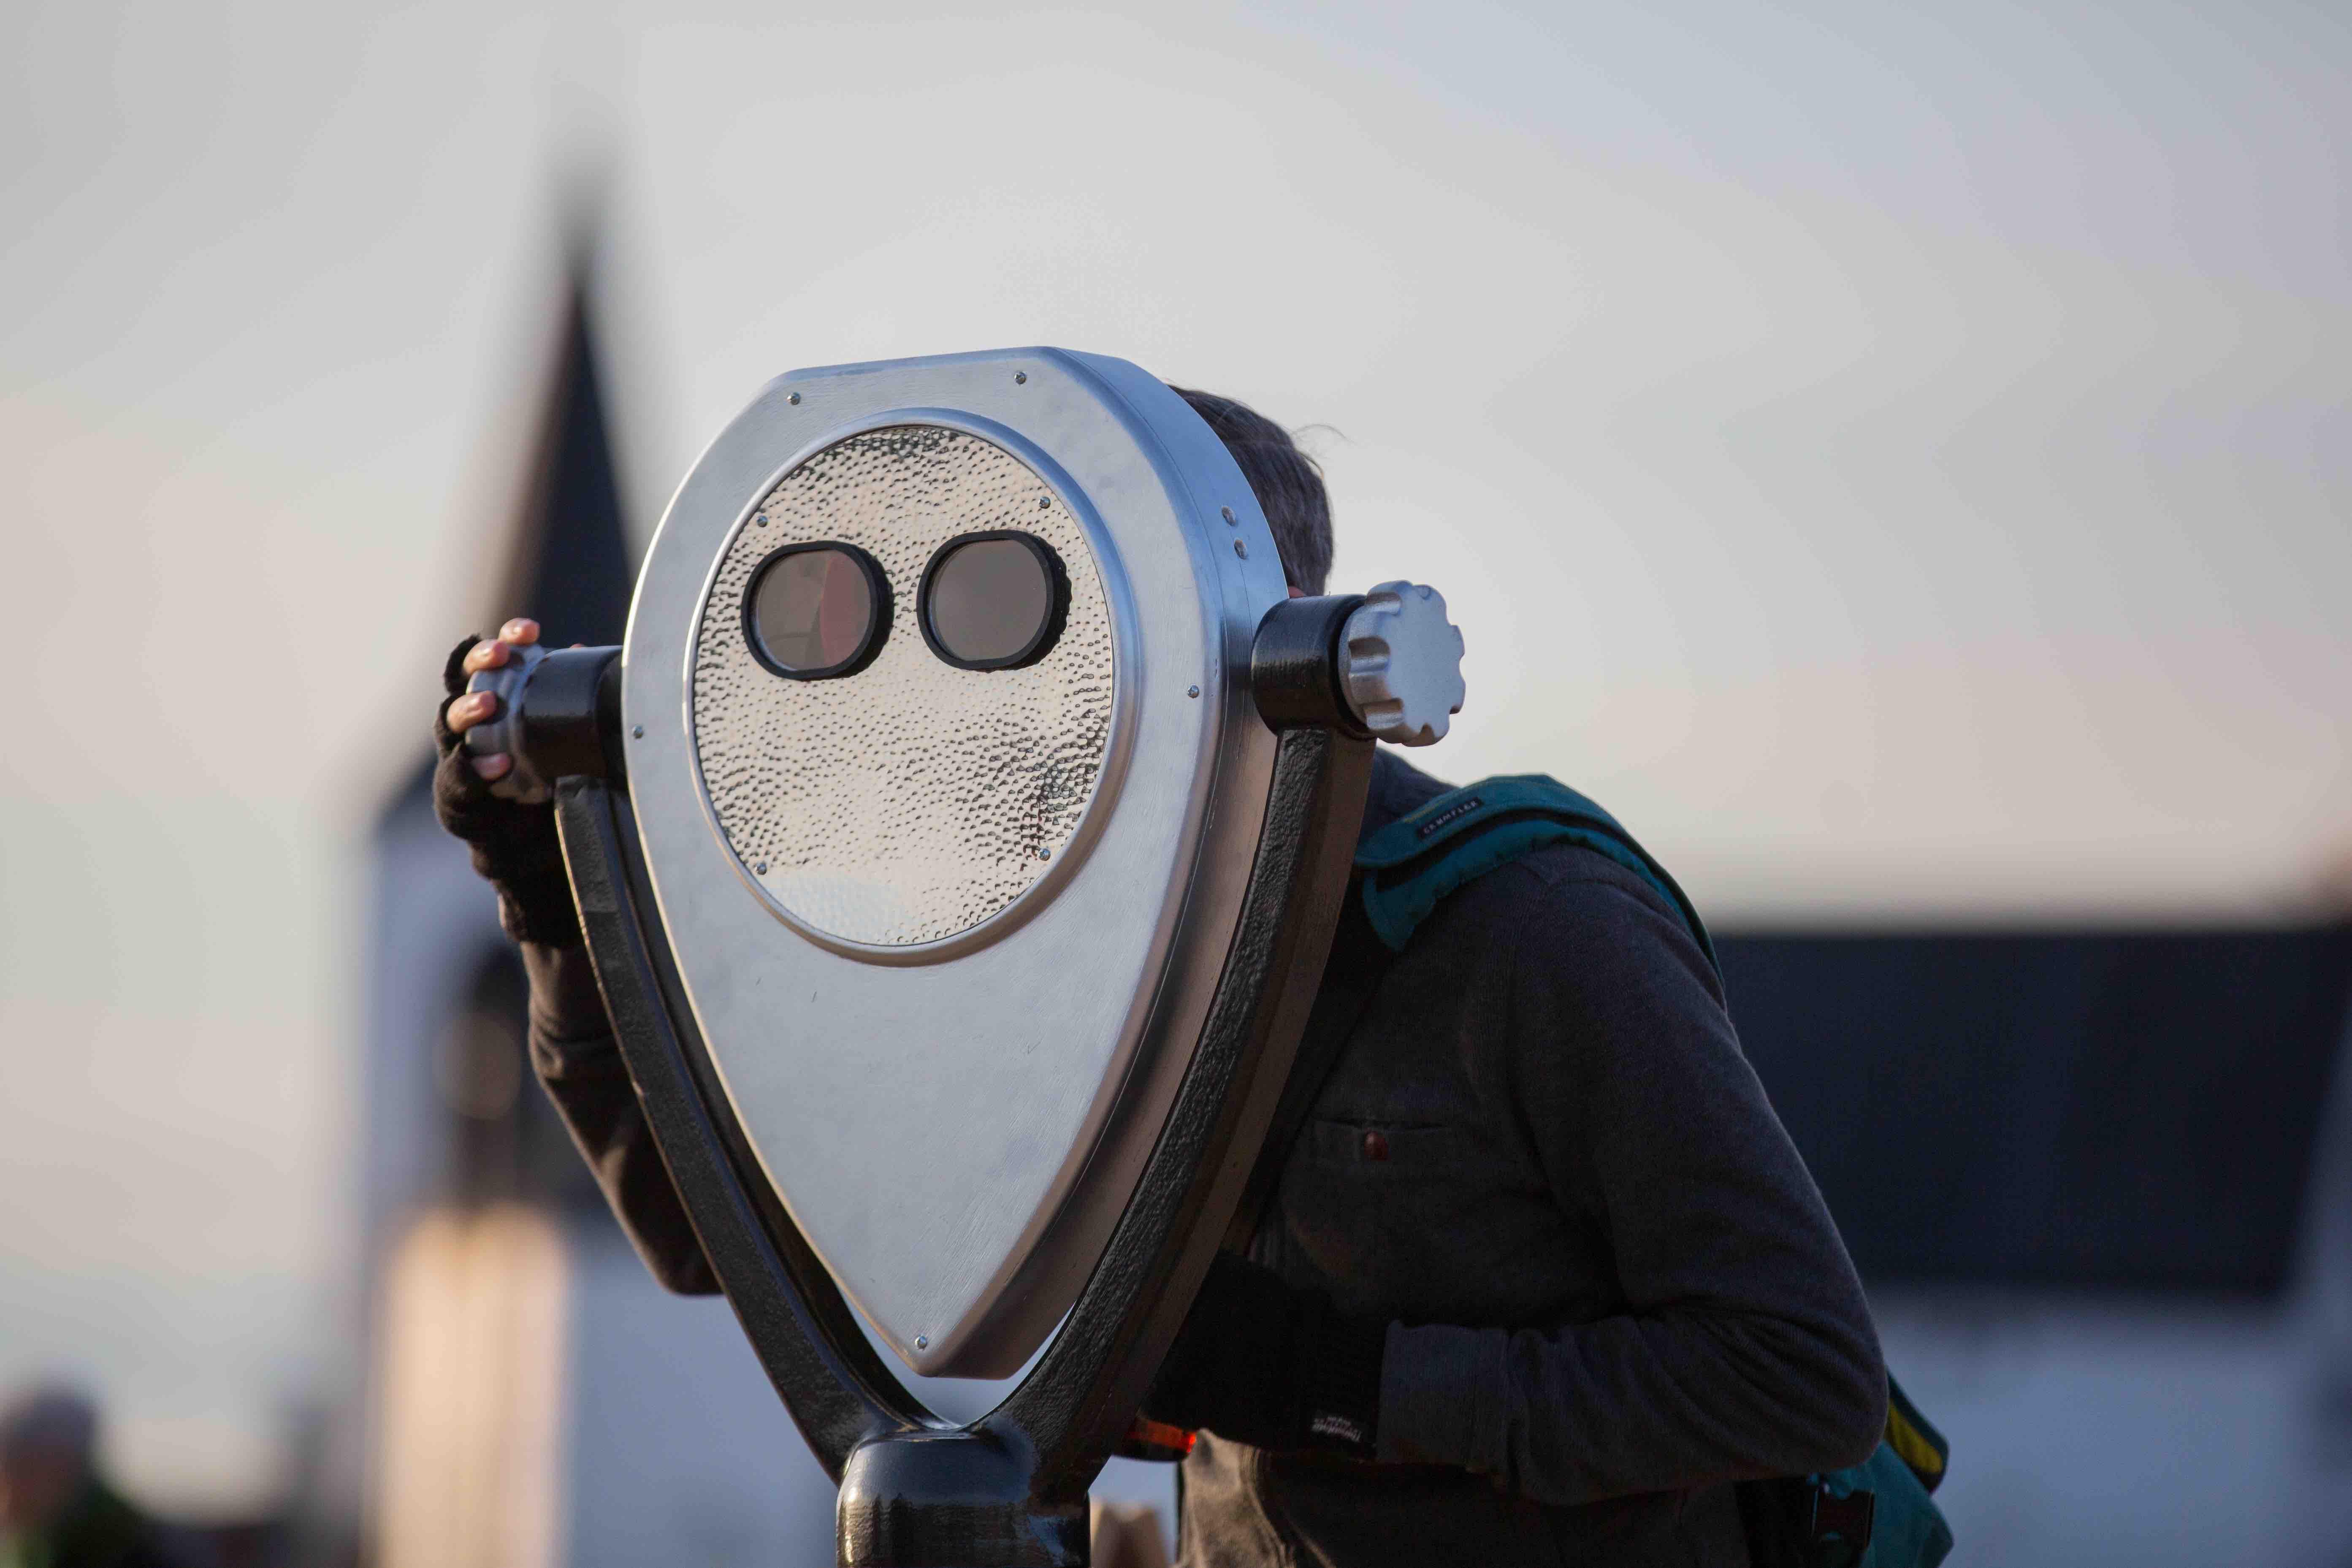 AR binoculars, image Paul Blakemore